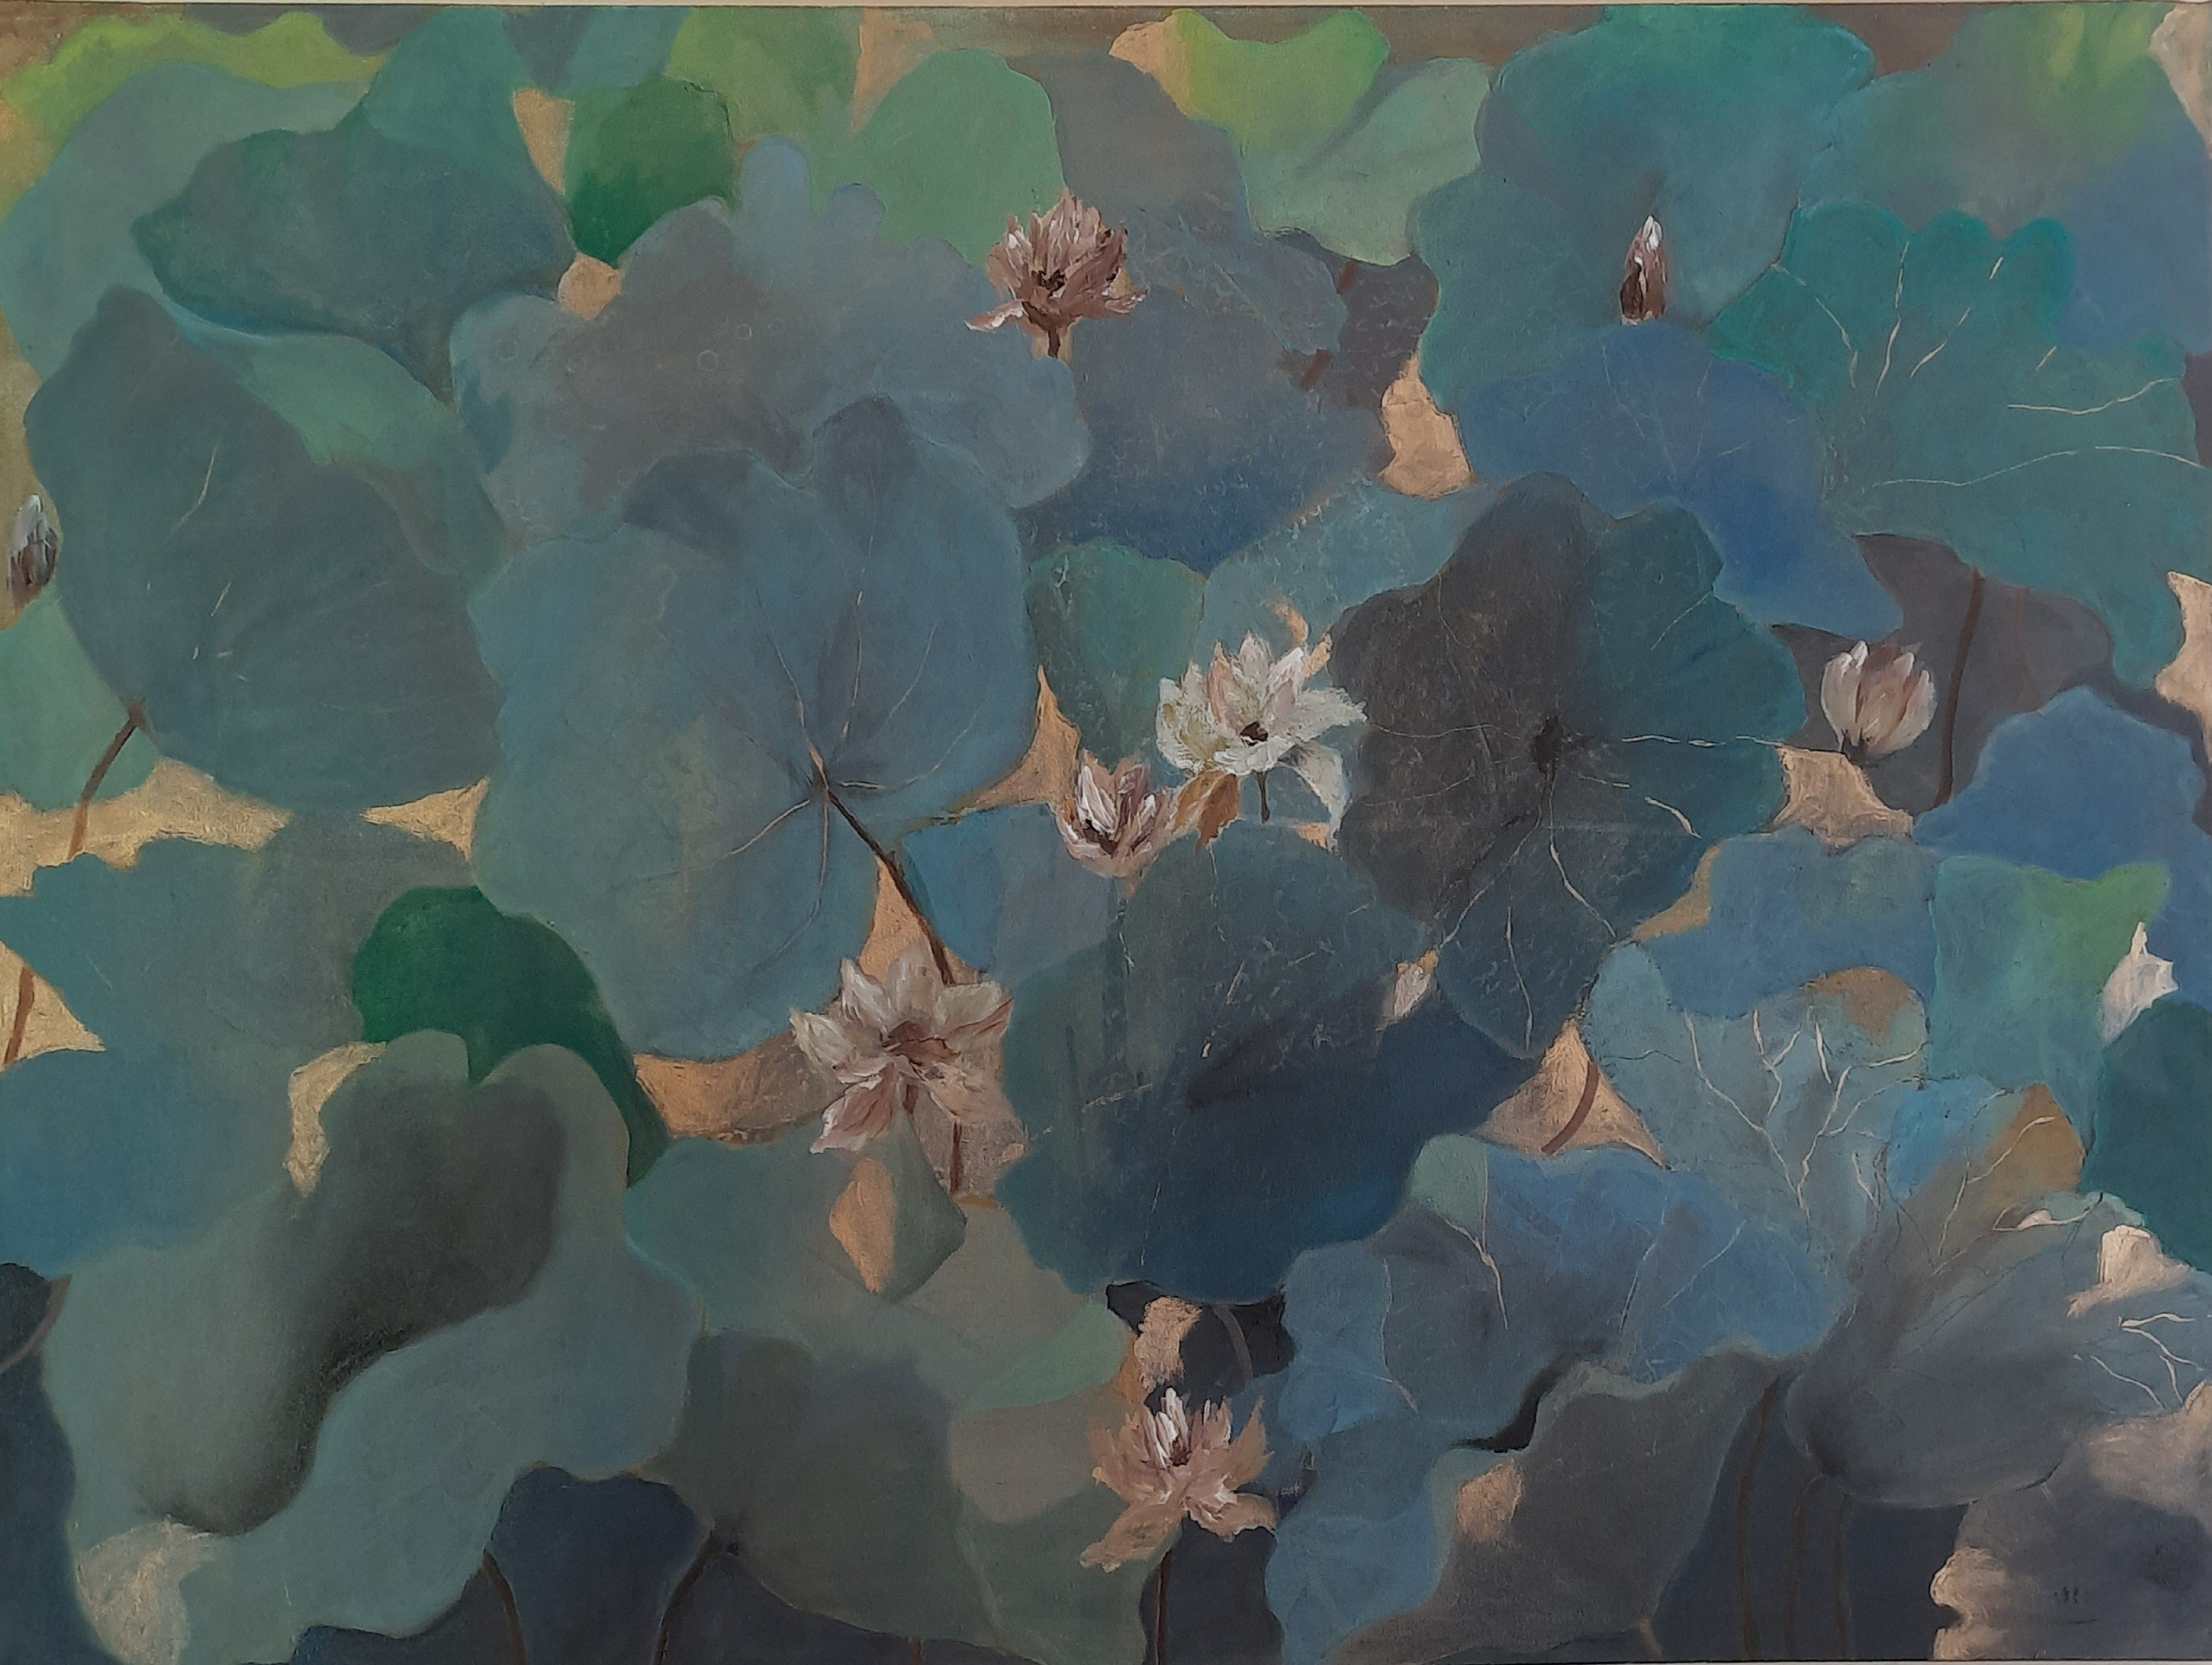 Shades of blue by Jean wijesekera